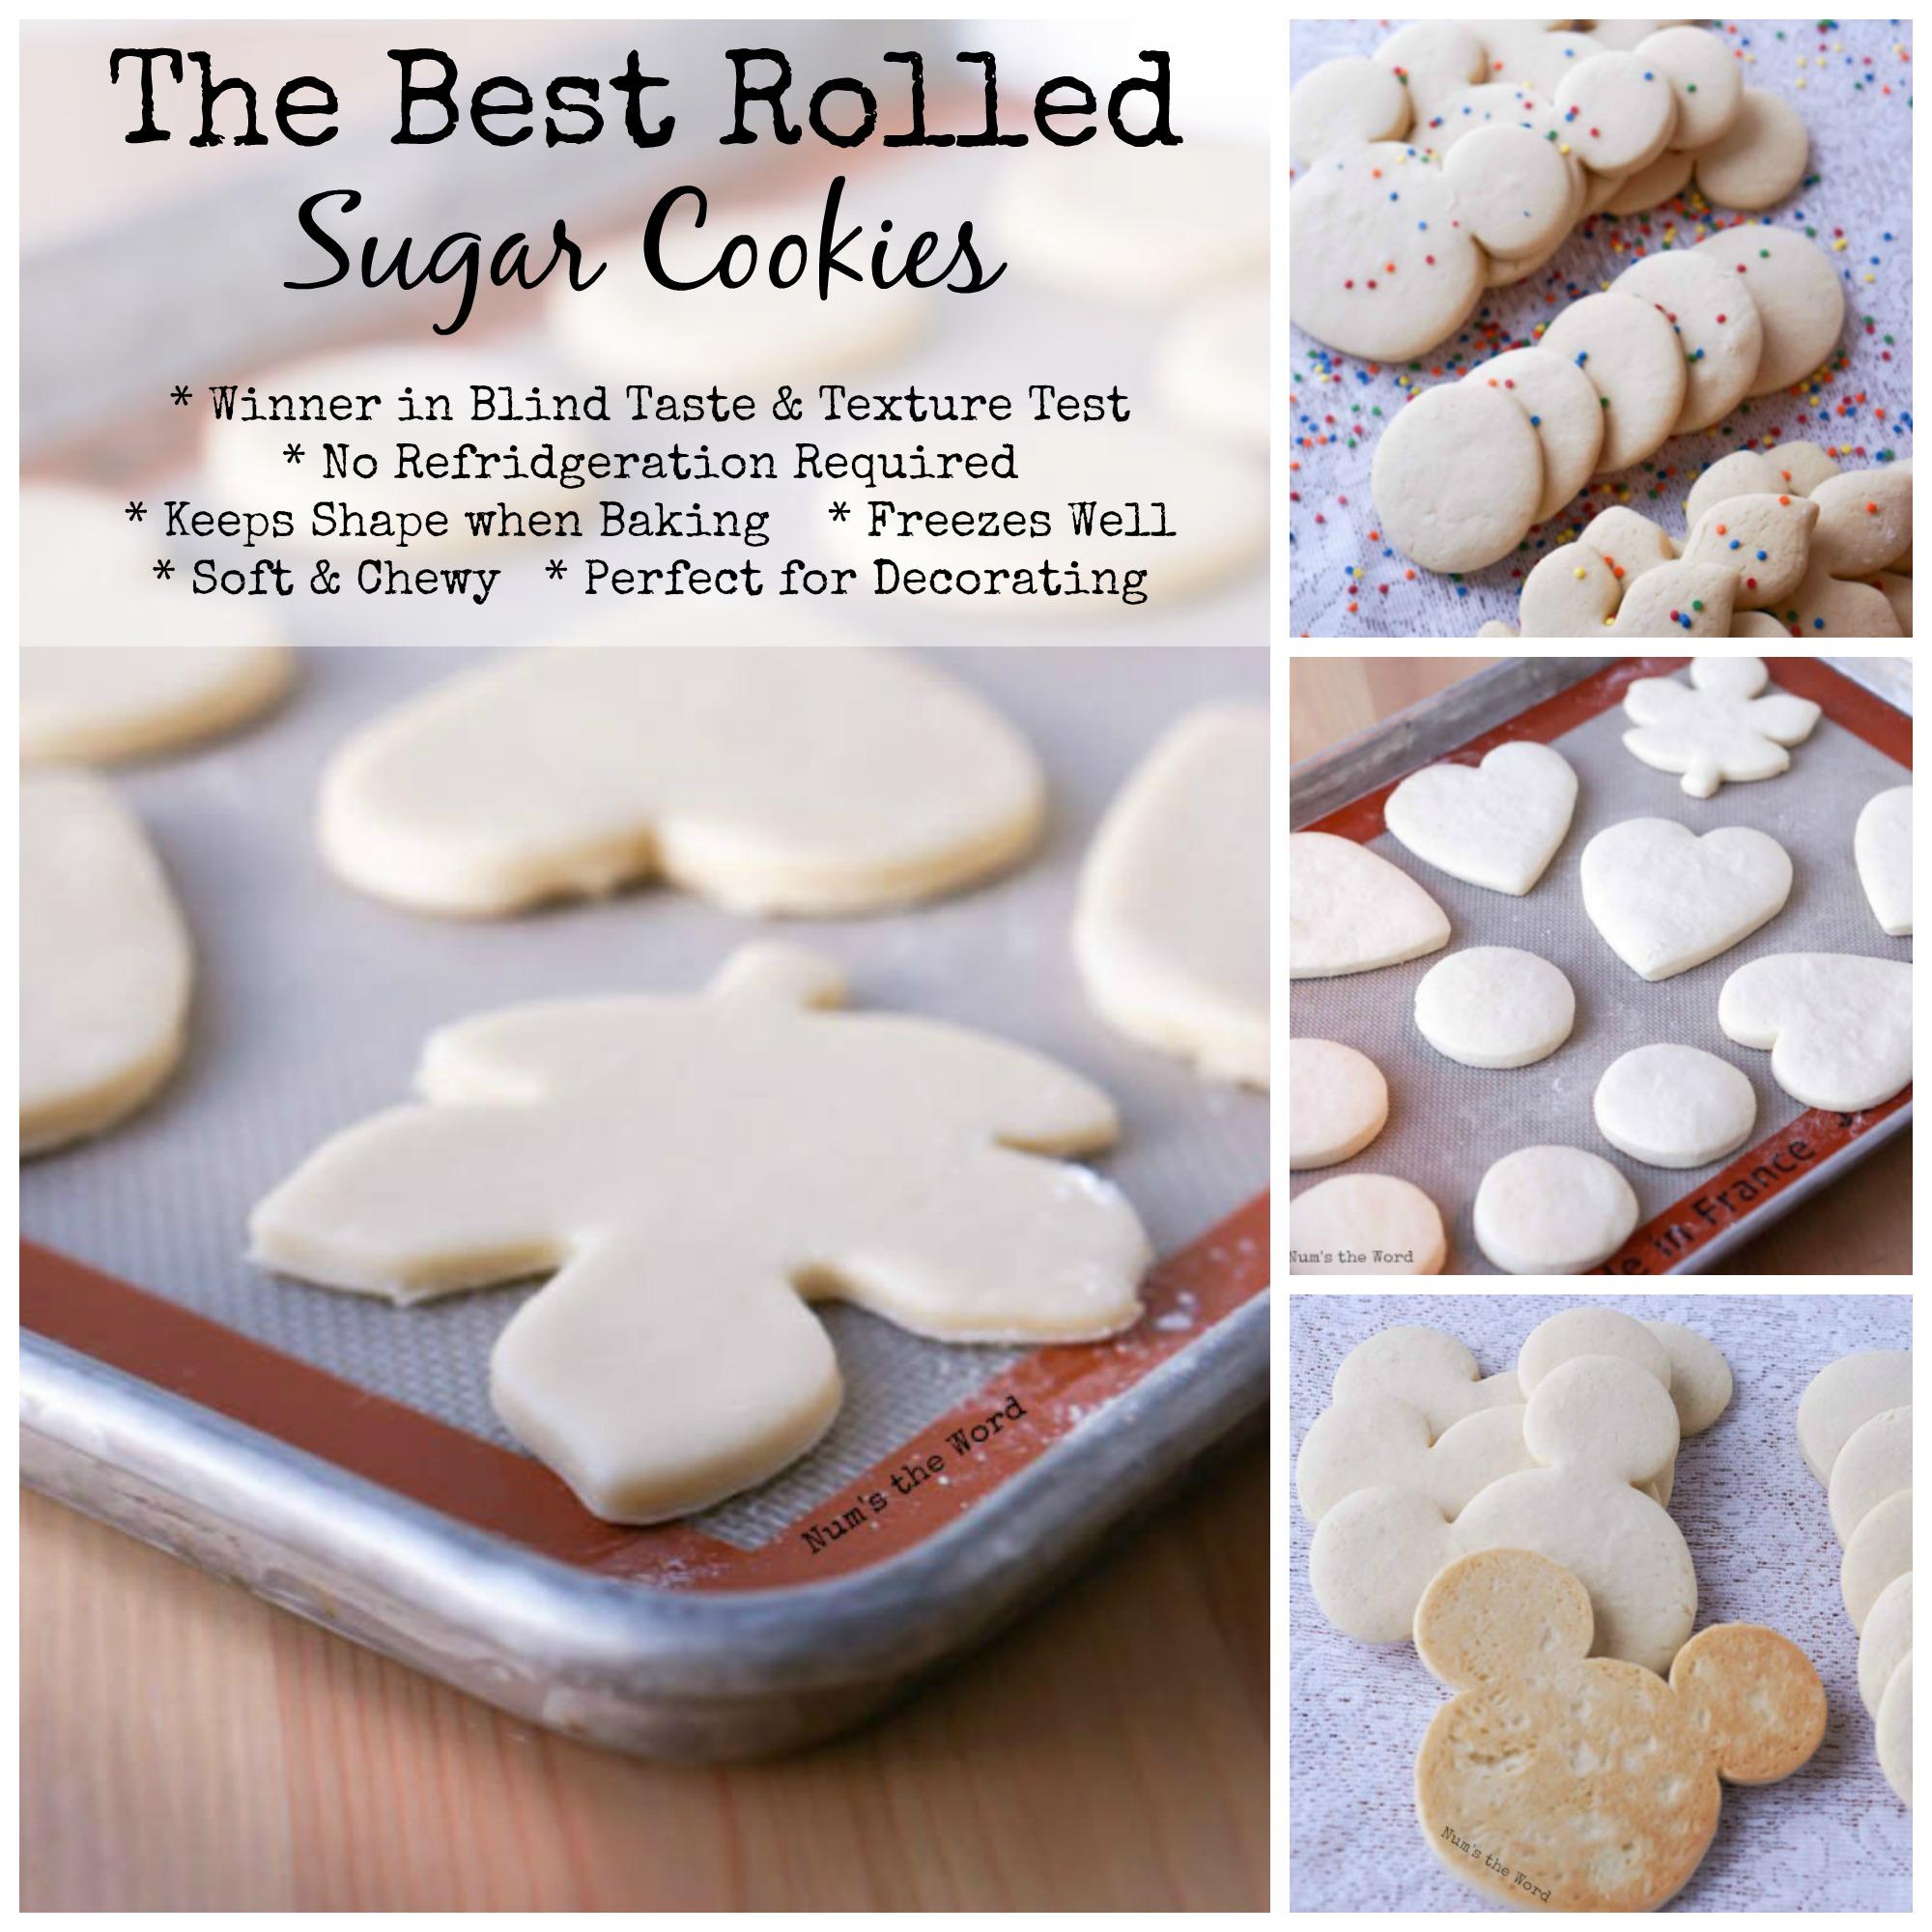 The Best Rolled Sugar Cookies - NumsTheWord